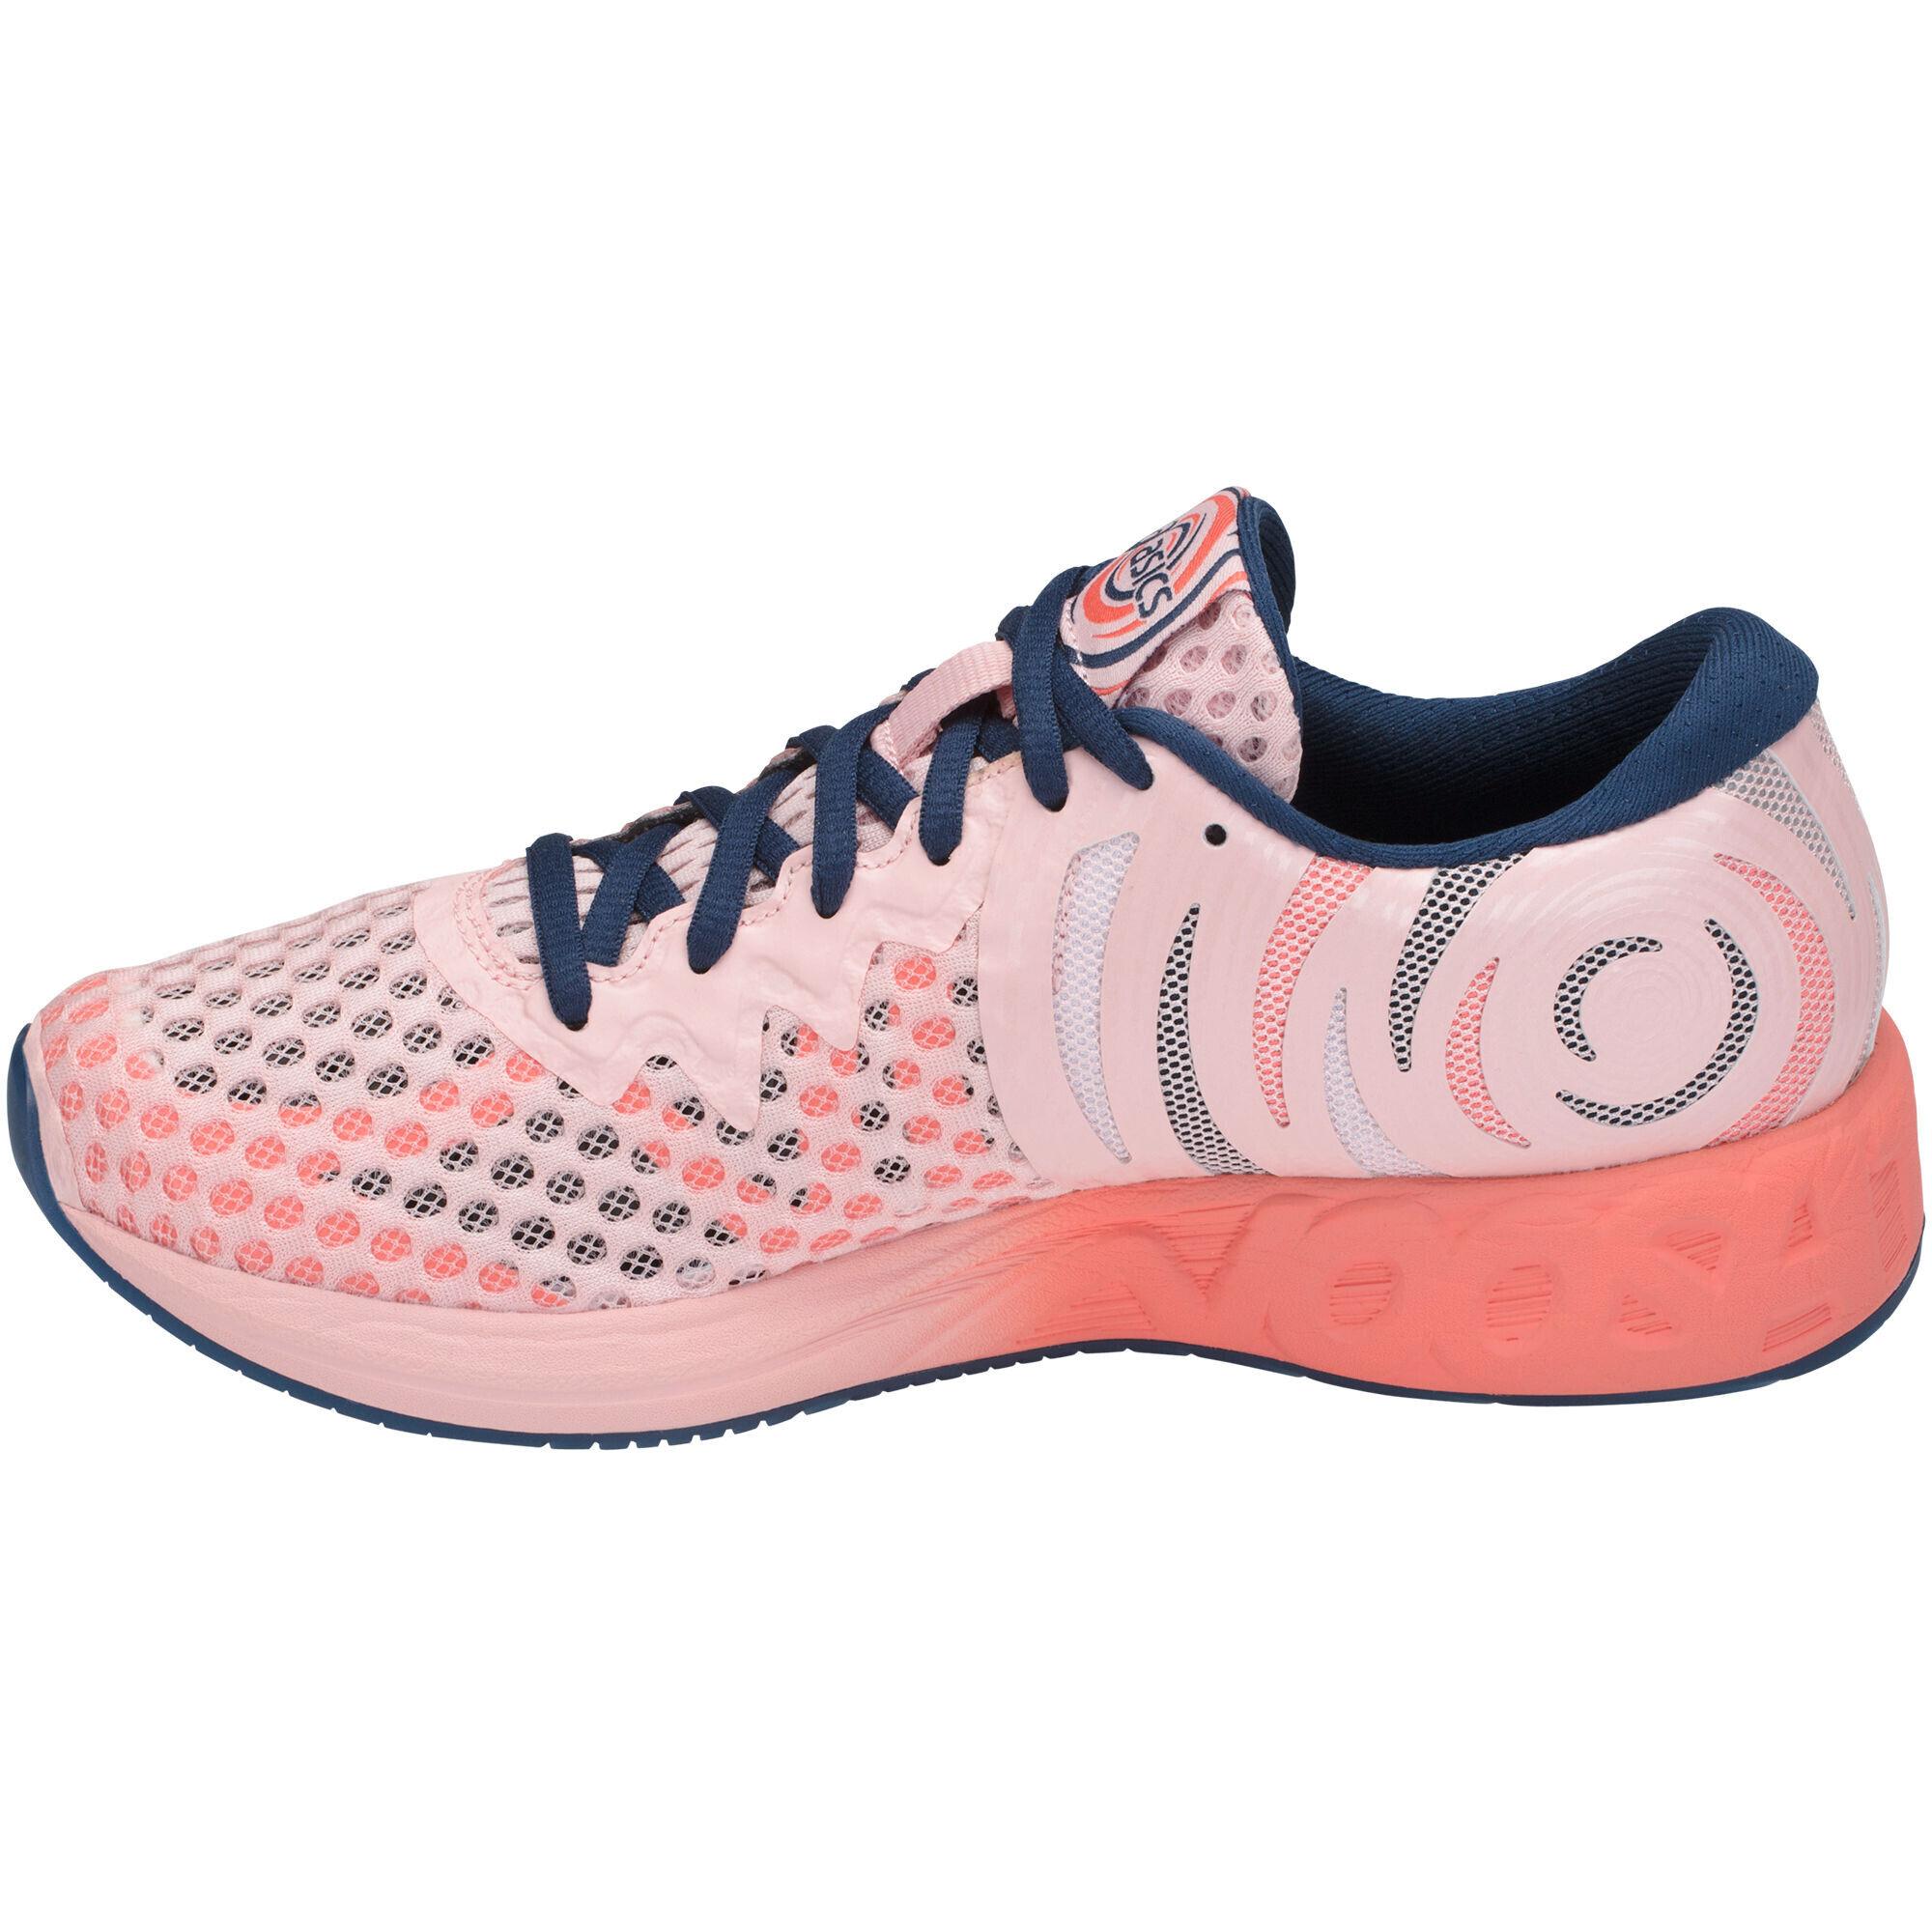 asics Noosa FF 2 Schuhe Damen seashell pinkdark bluebegoni